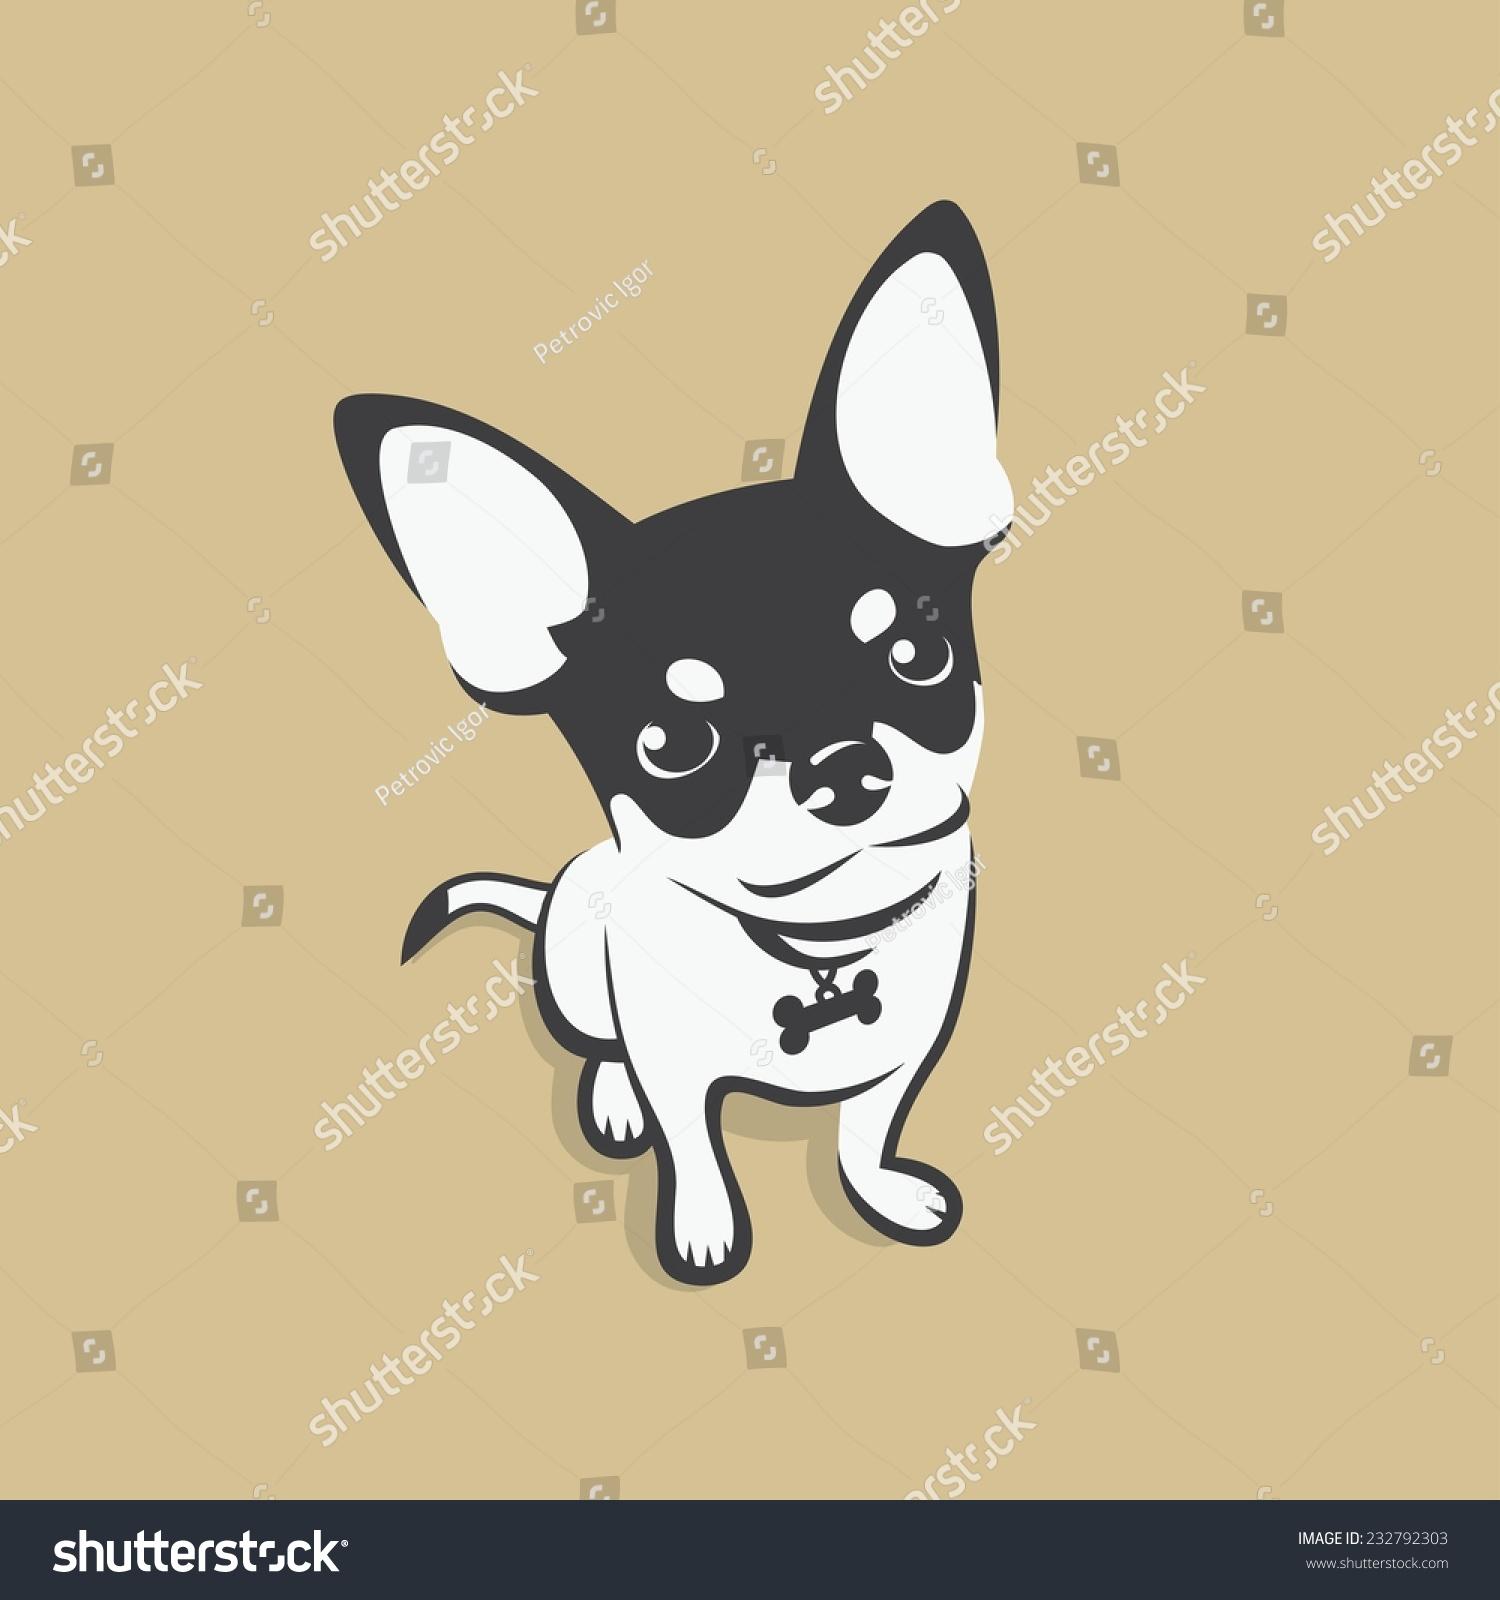 Chihuahua Dog Vector Illustration Vector de stock (libre de regalías ...